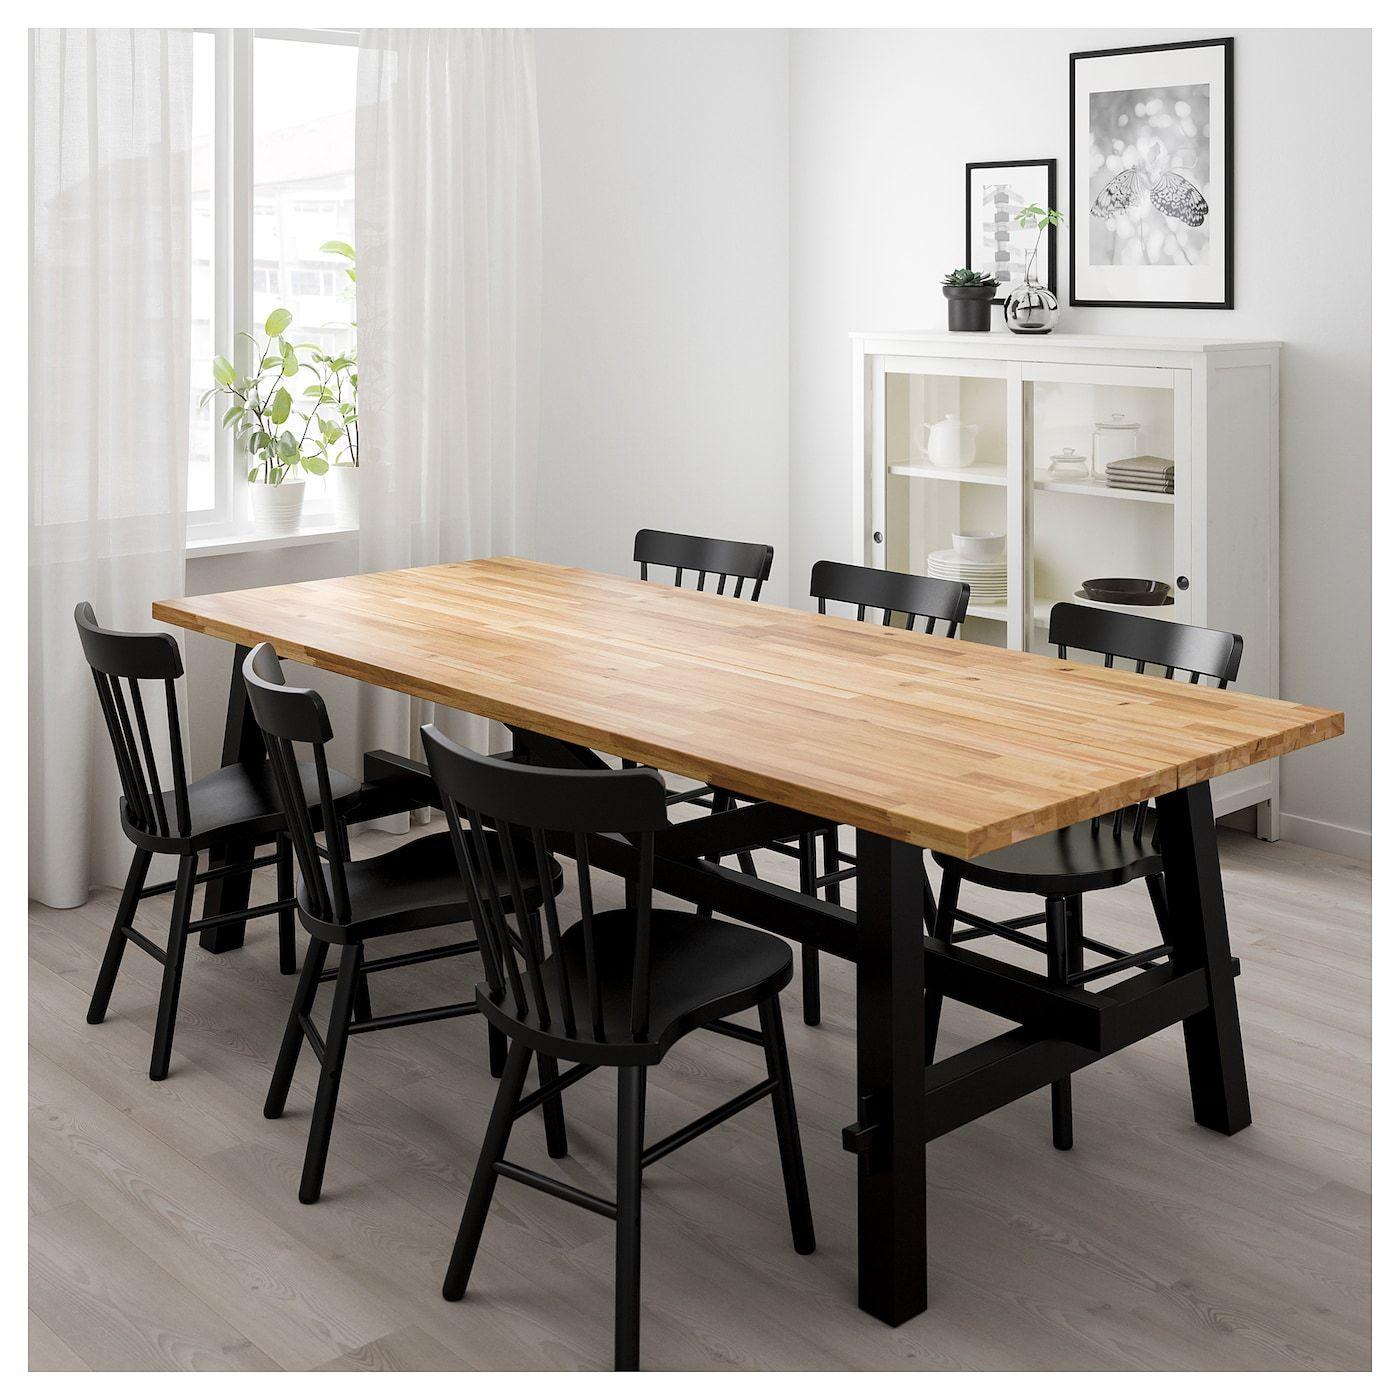 Vierkante Eettafel Ikea.Eettafel Skogsta Acacia Eettafel Eetkamertafel En Stoel Ikea